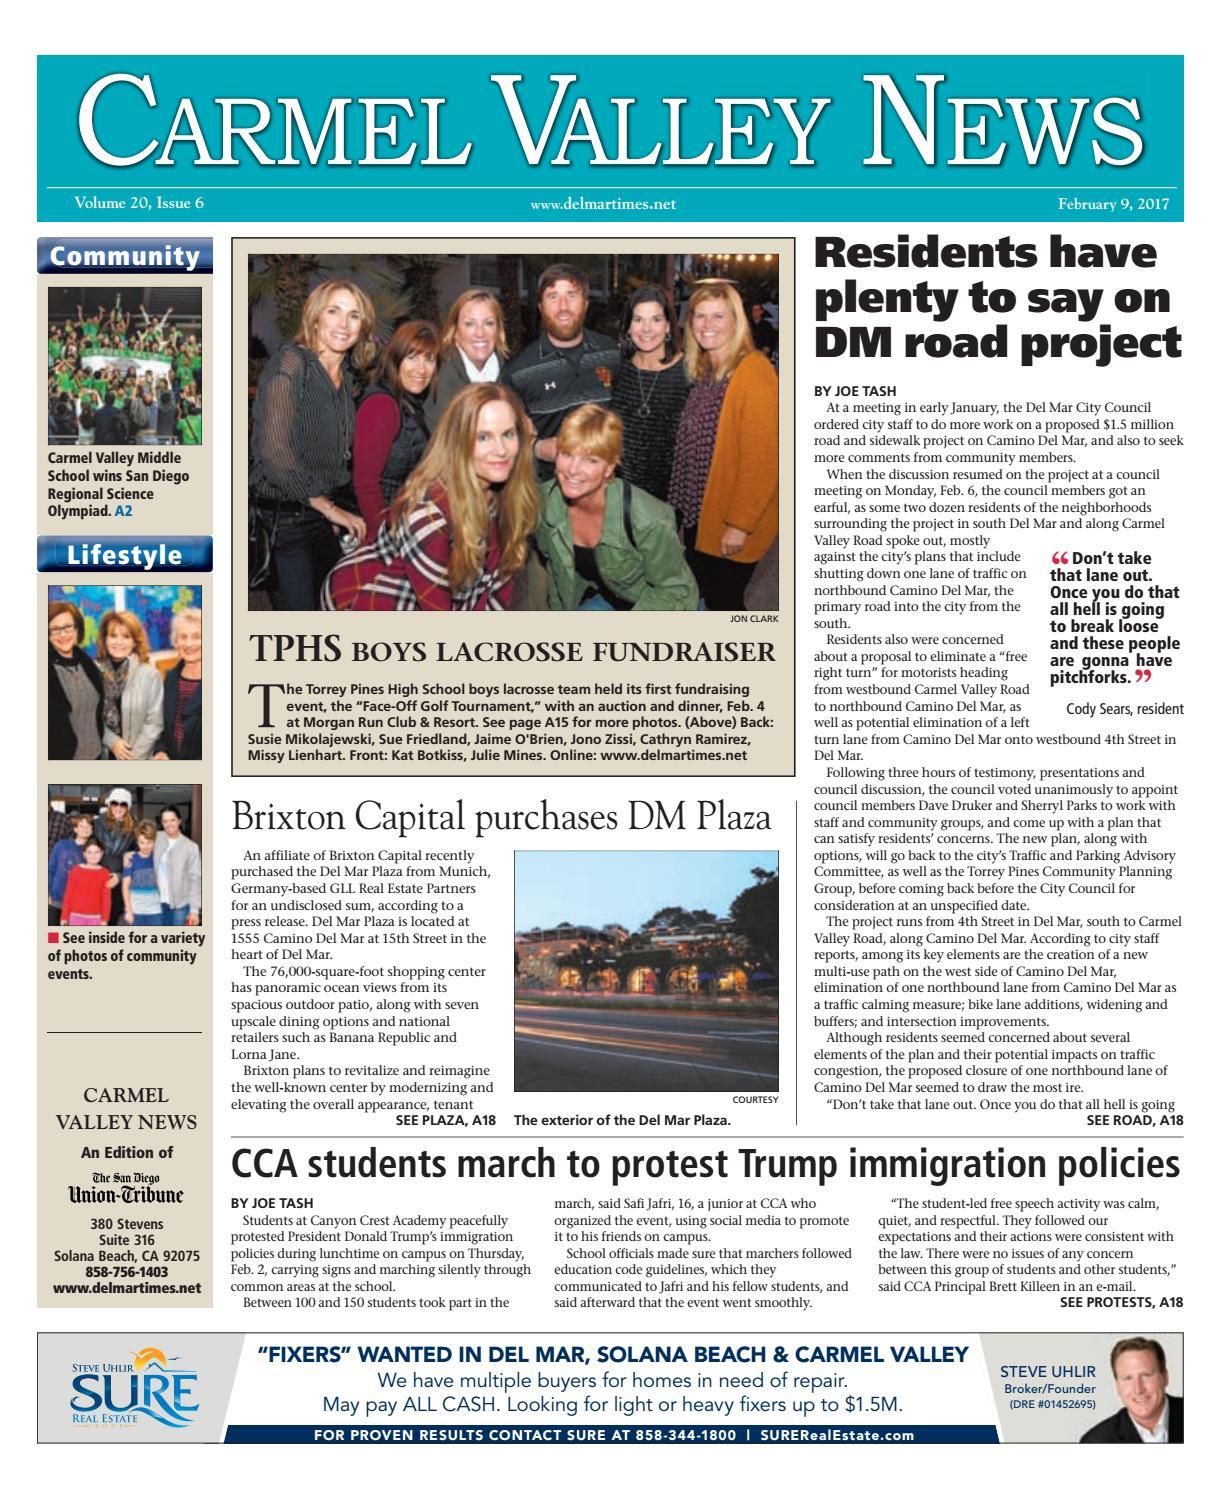 Carmel valley news 02 09 17 by mainstreet media issuu fandeluxe Gallery